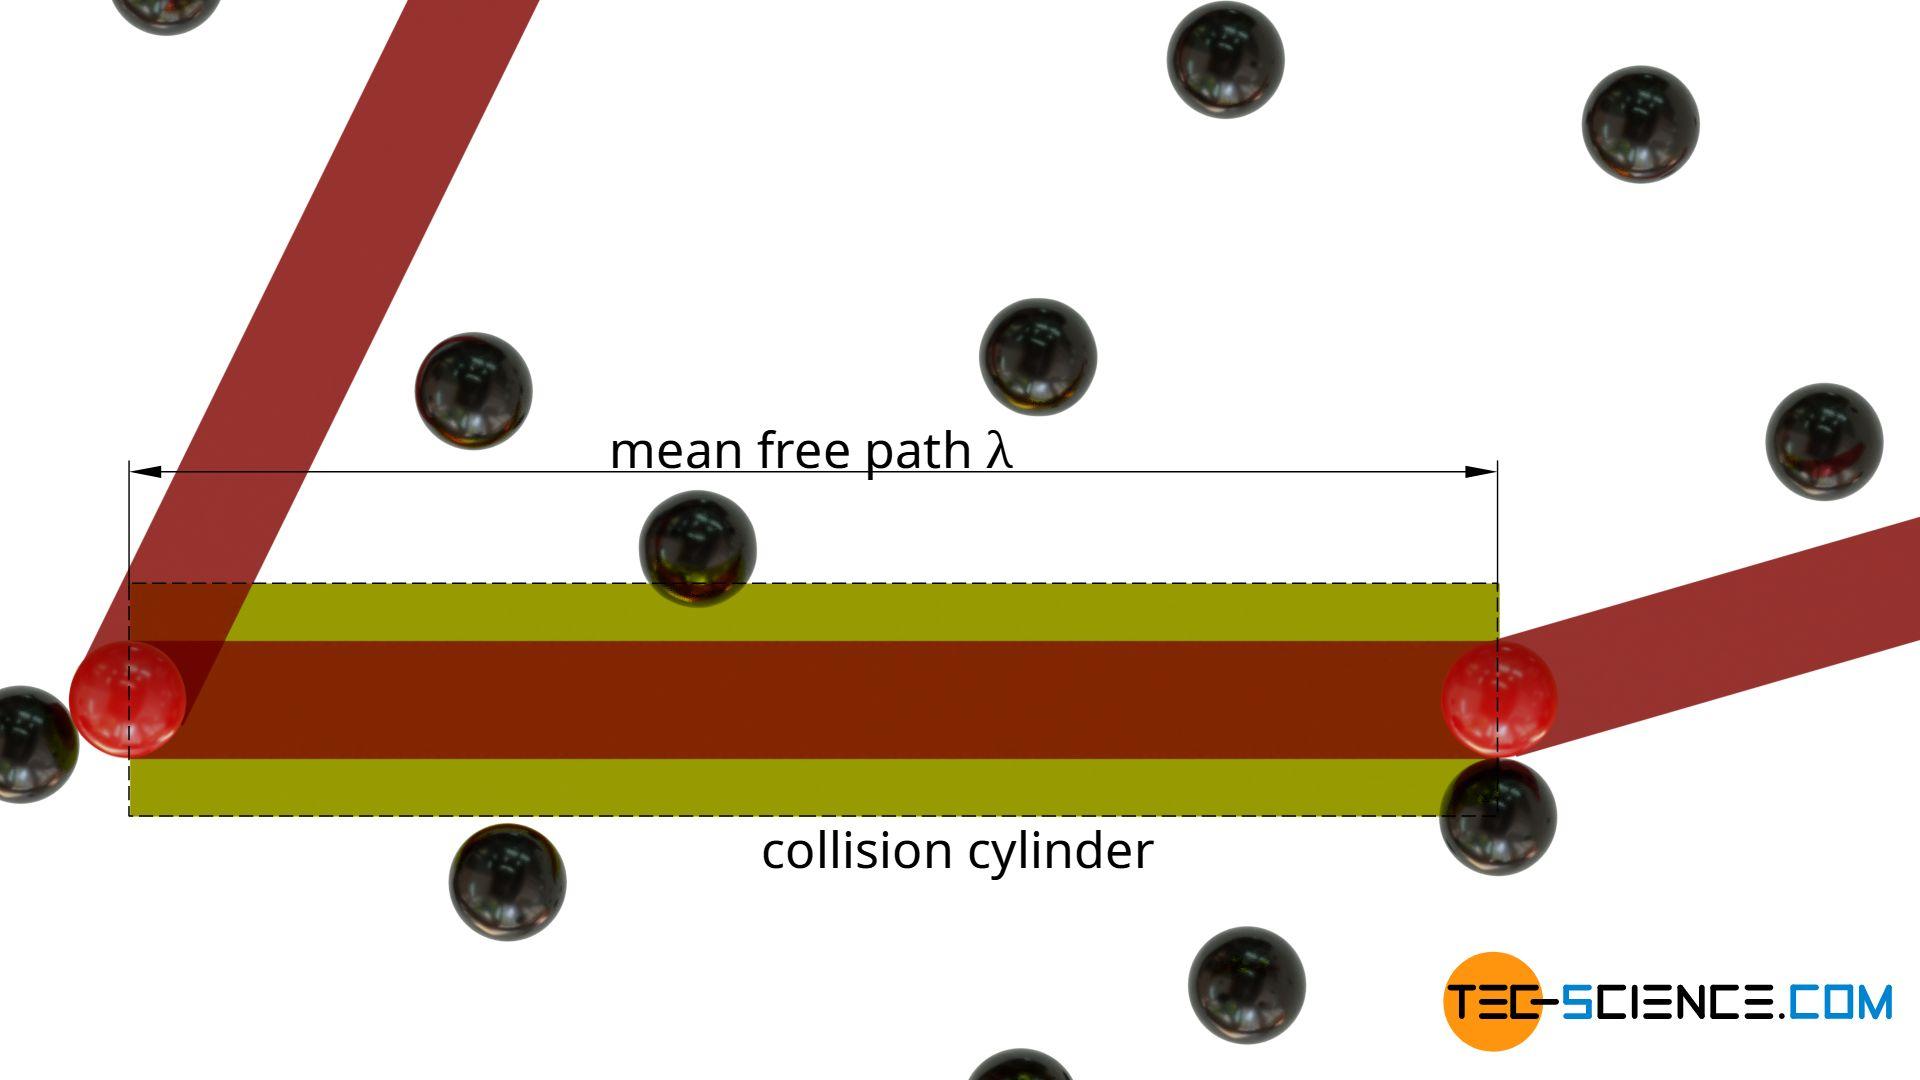 Mean free path of a molecule in a gas